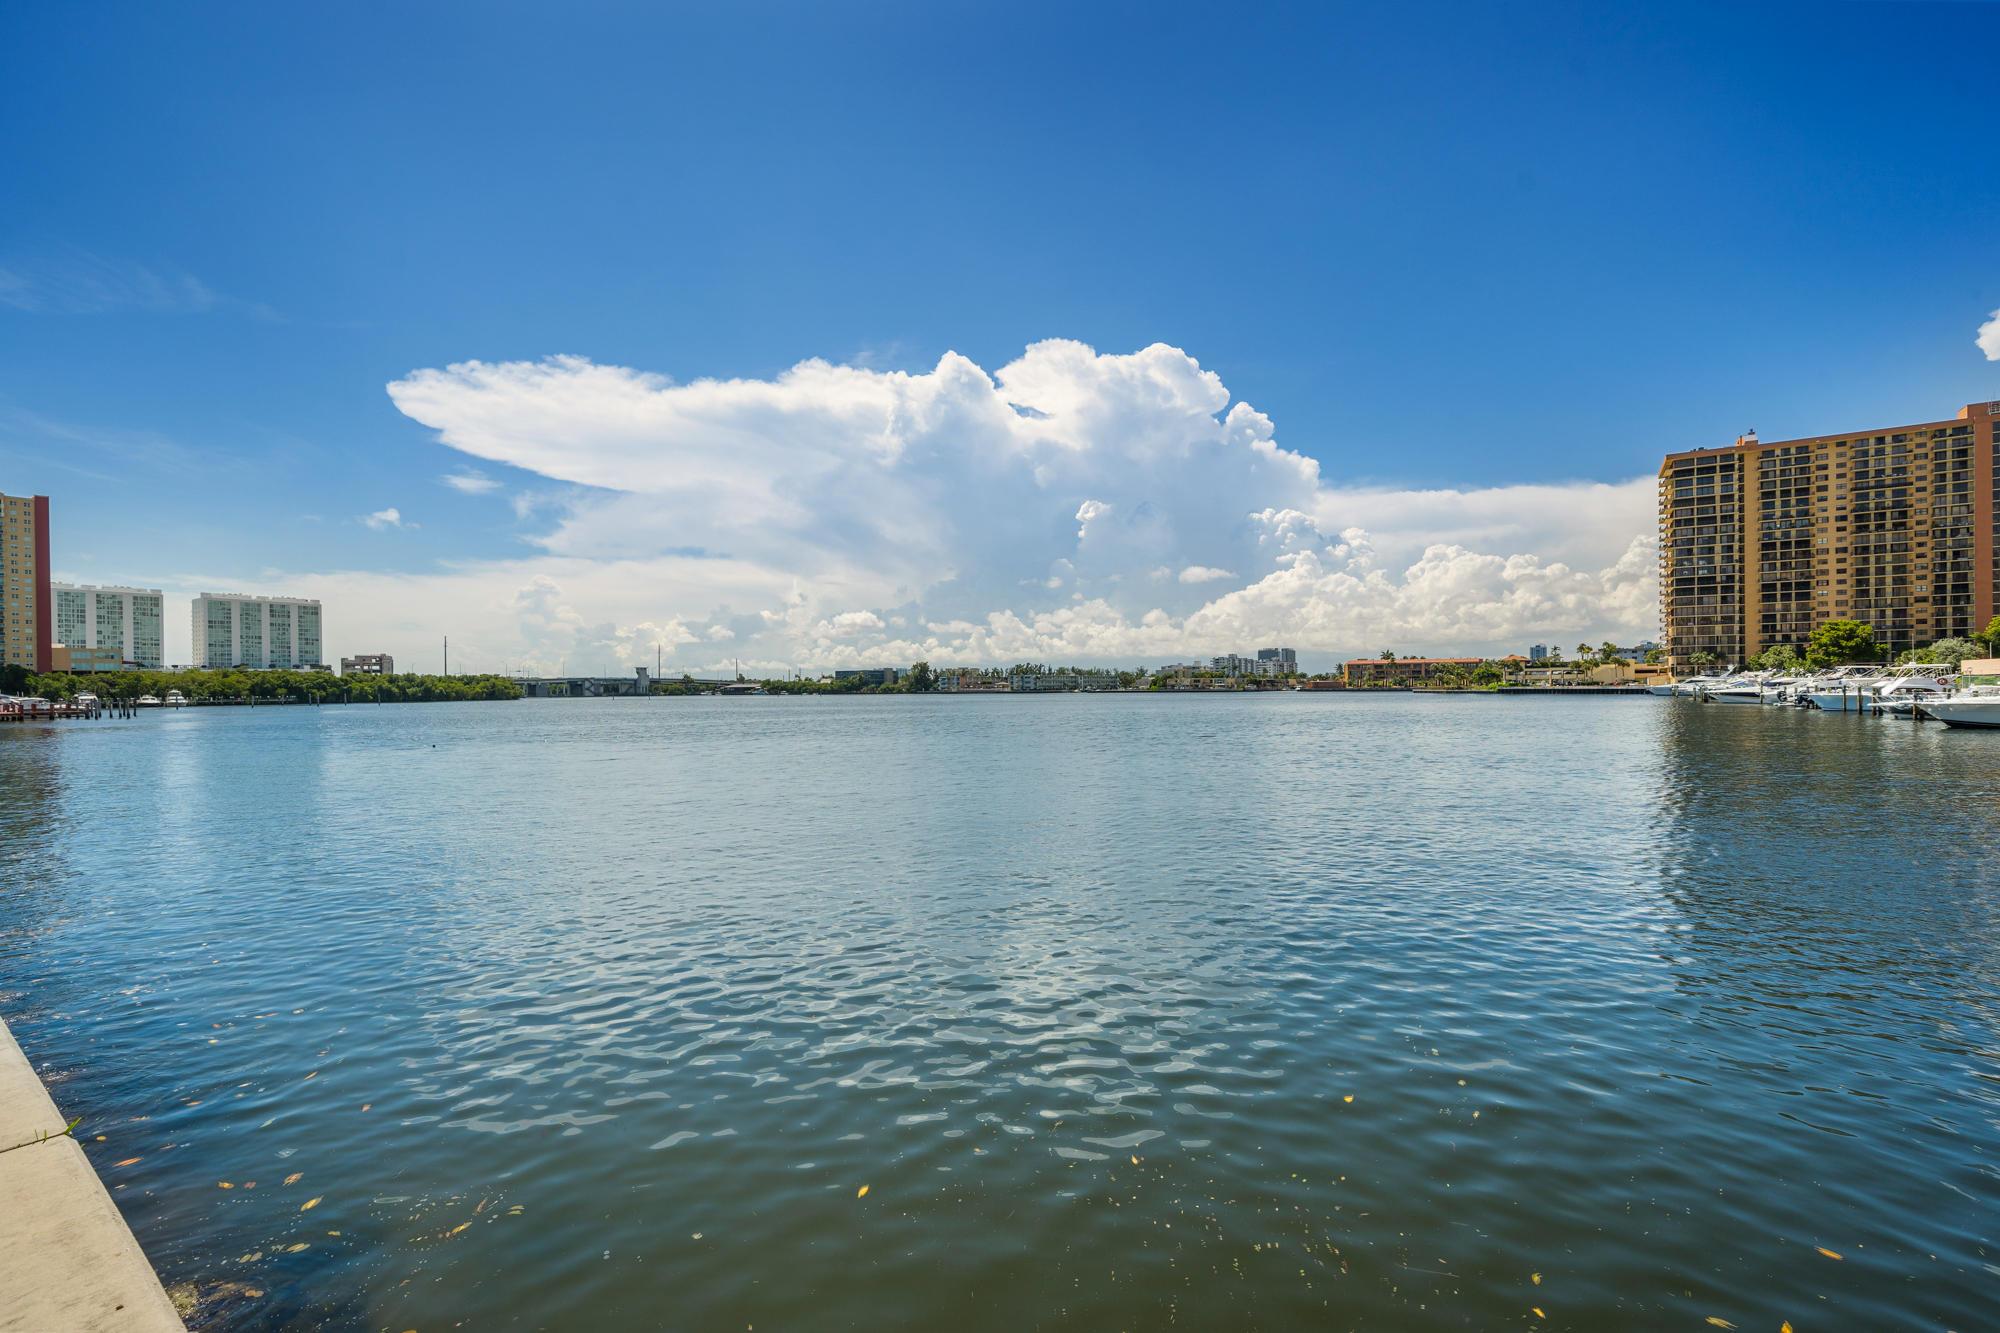 17150 N Bay Road 2109 Sunny Isles Beach, FL 33160 photo 16